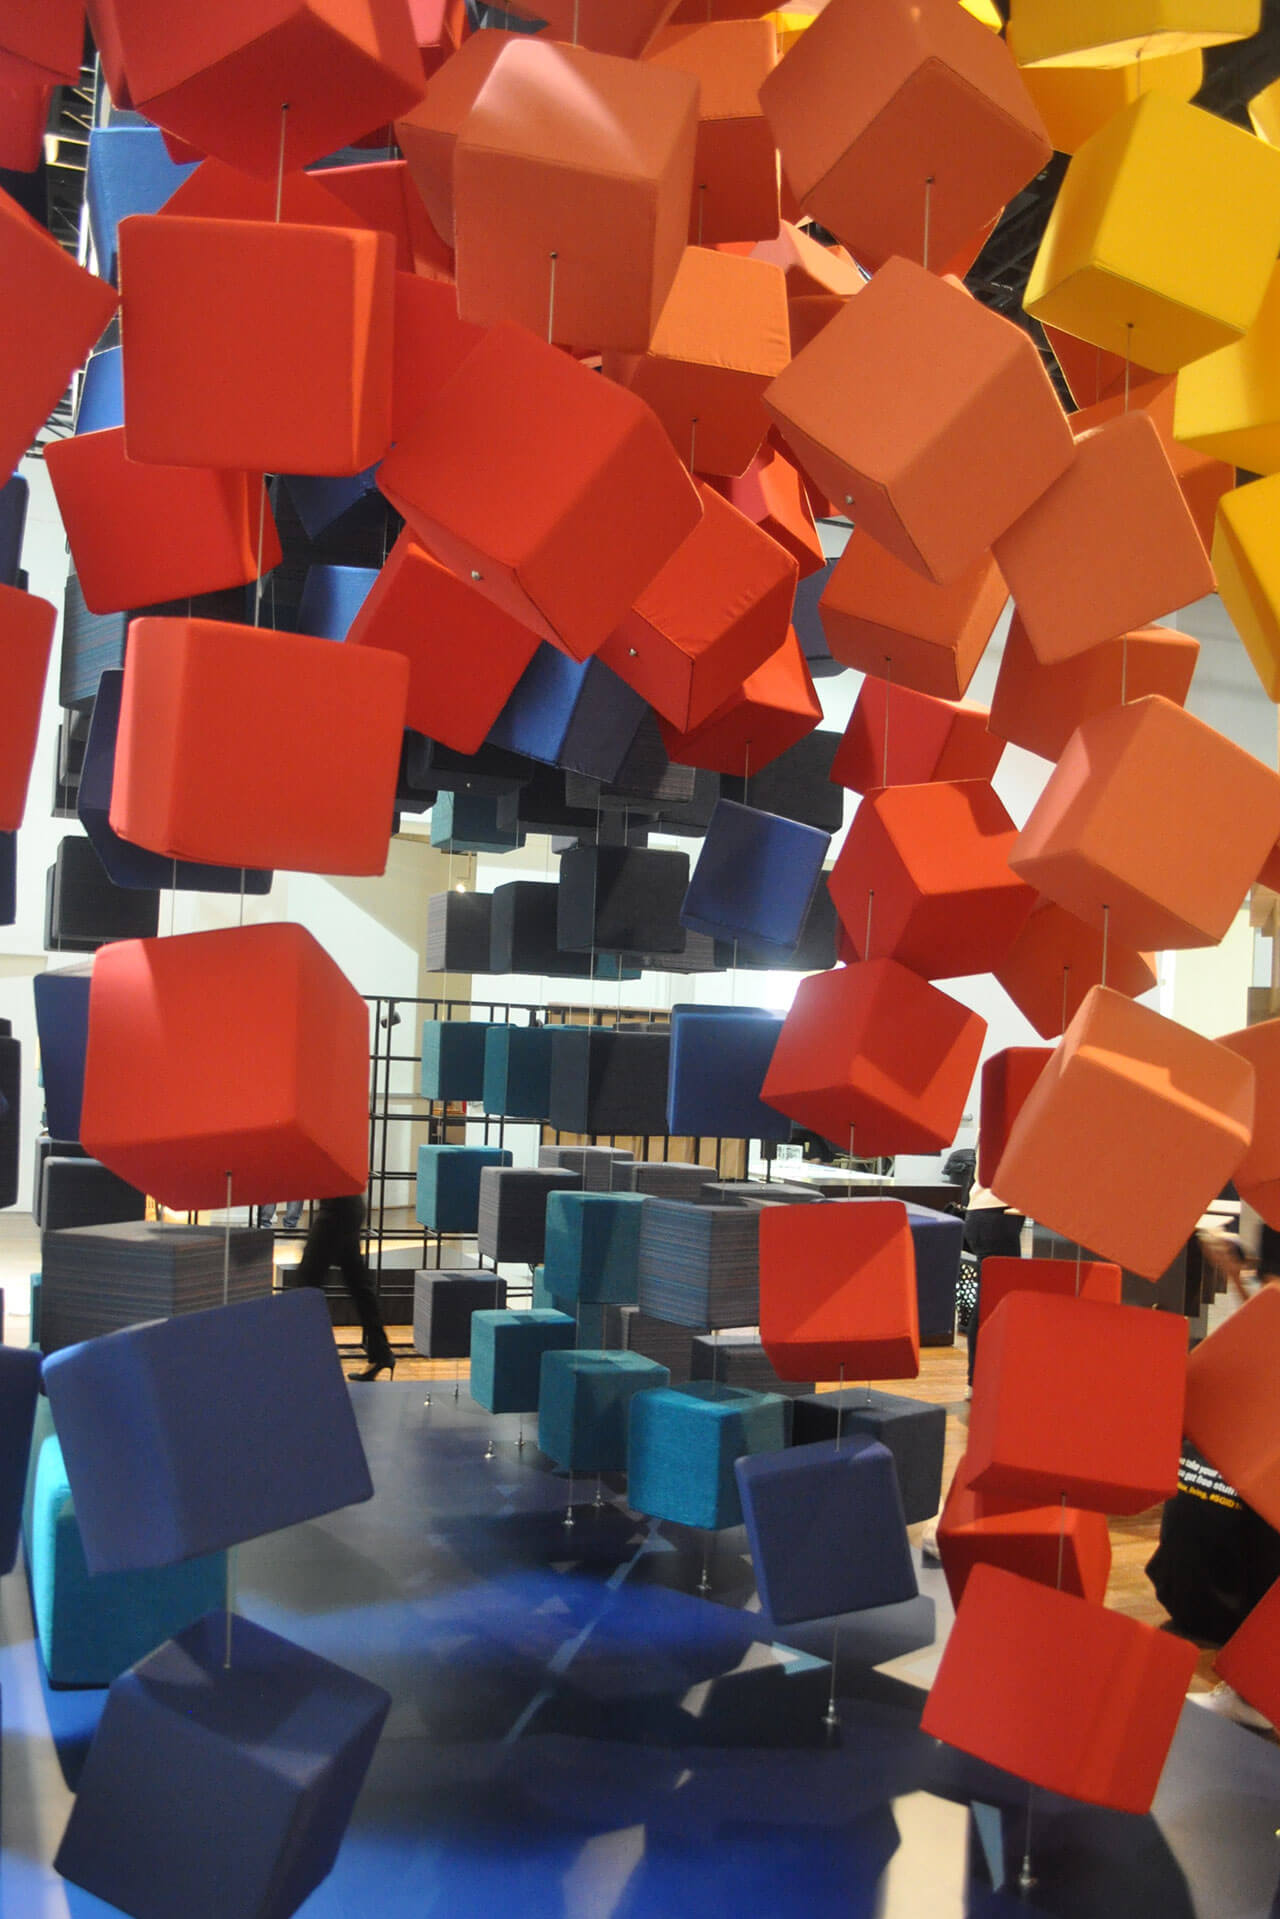 Sunbrella Spectrum 立方体为参观者构建通道,供其体验多种布料。